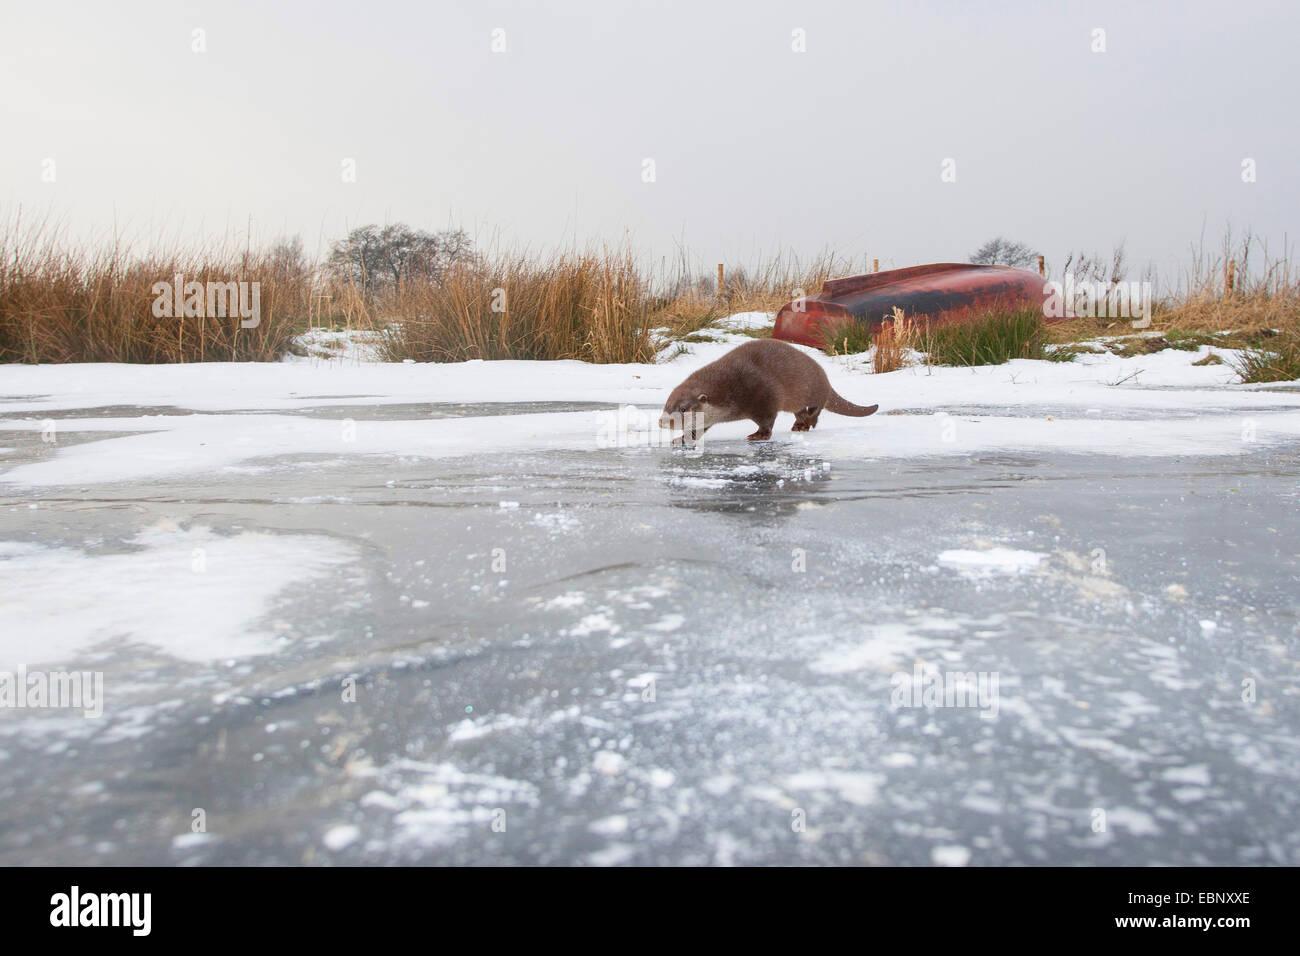 European river otter, European Otter, Eurasian Otter (Lutra lutra), female in the snow on a frozen up ice sheet, - Stock Image